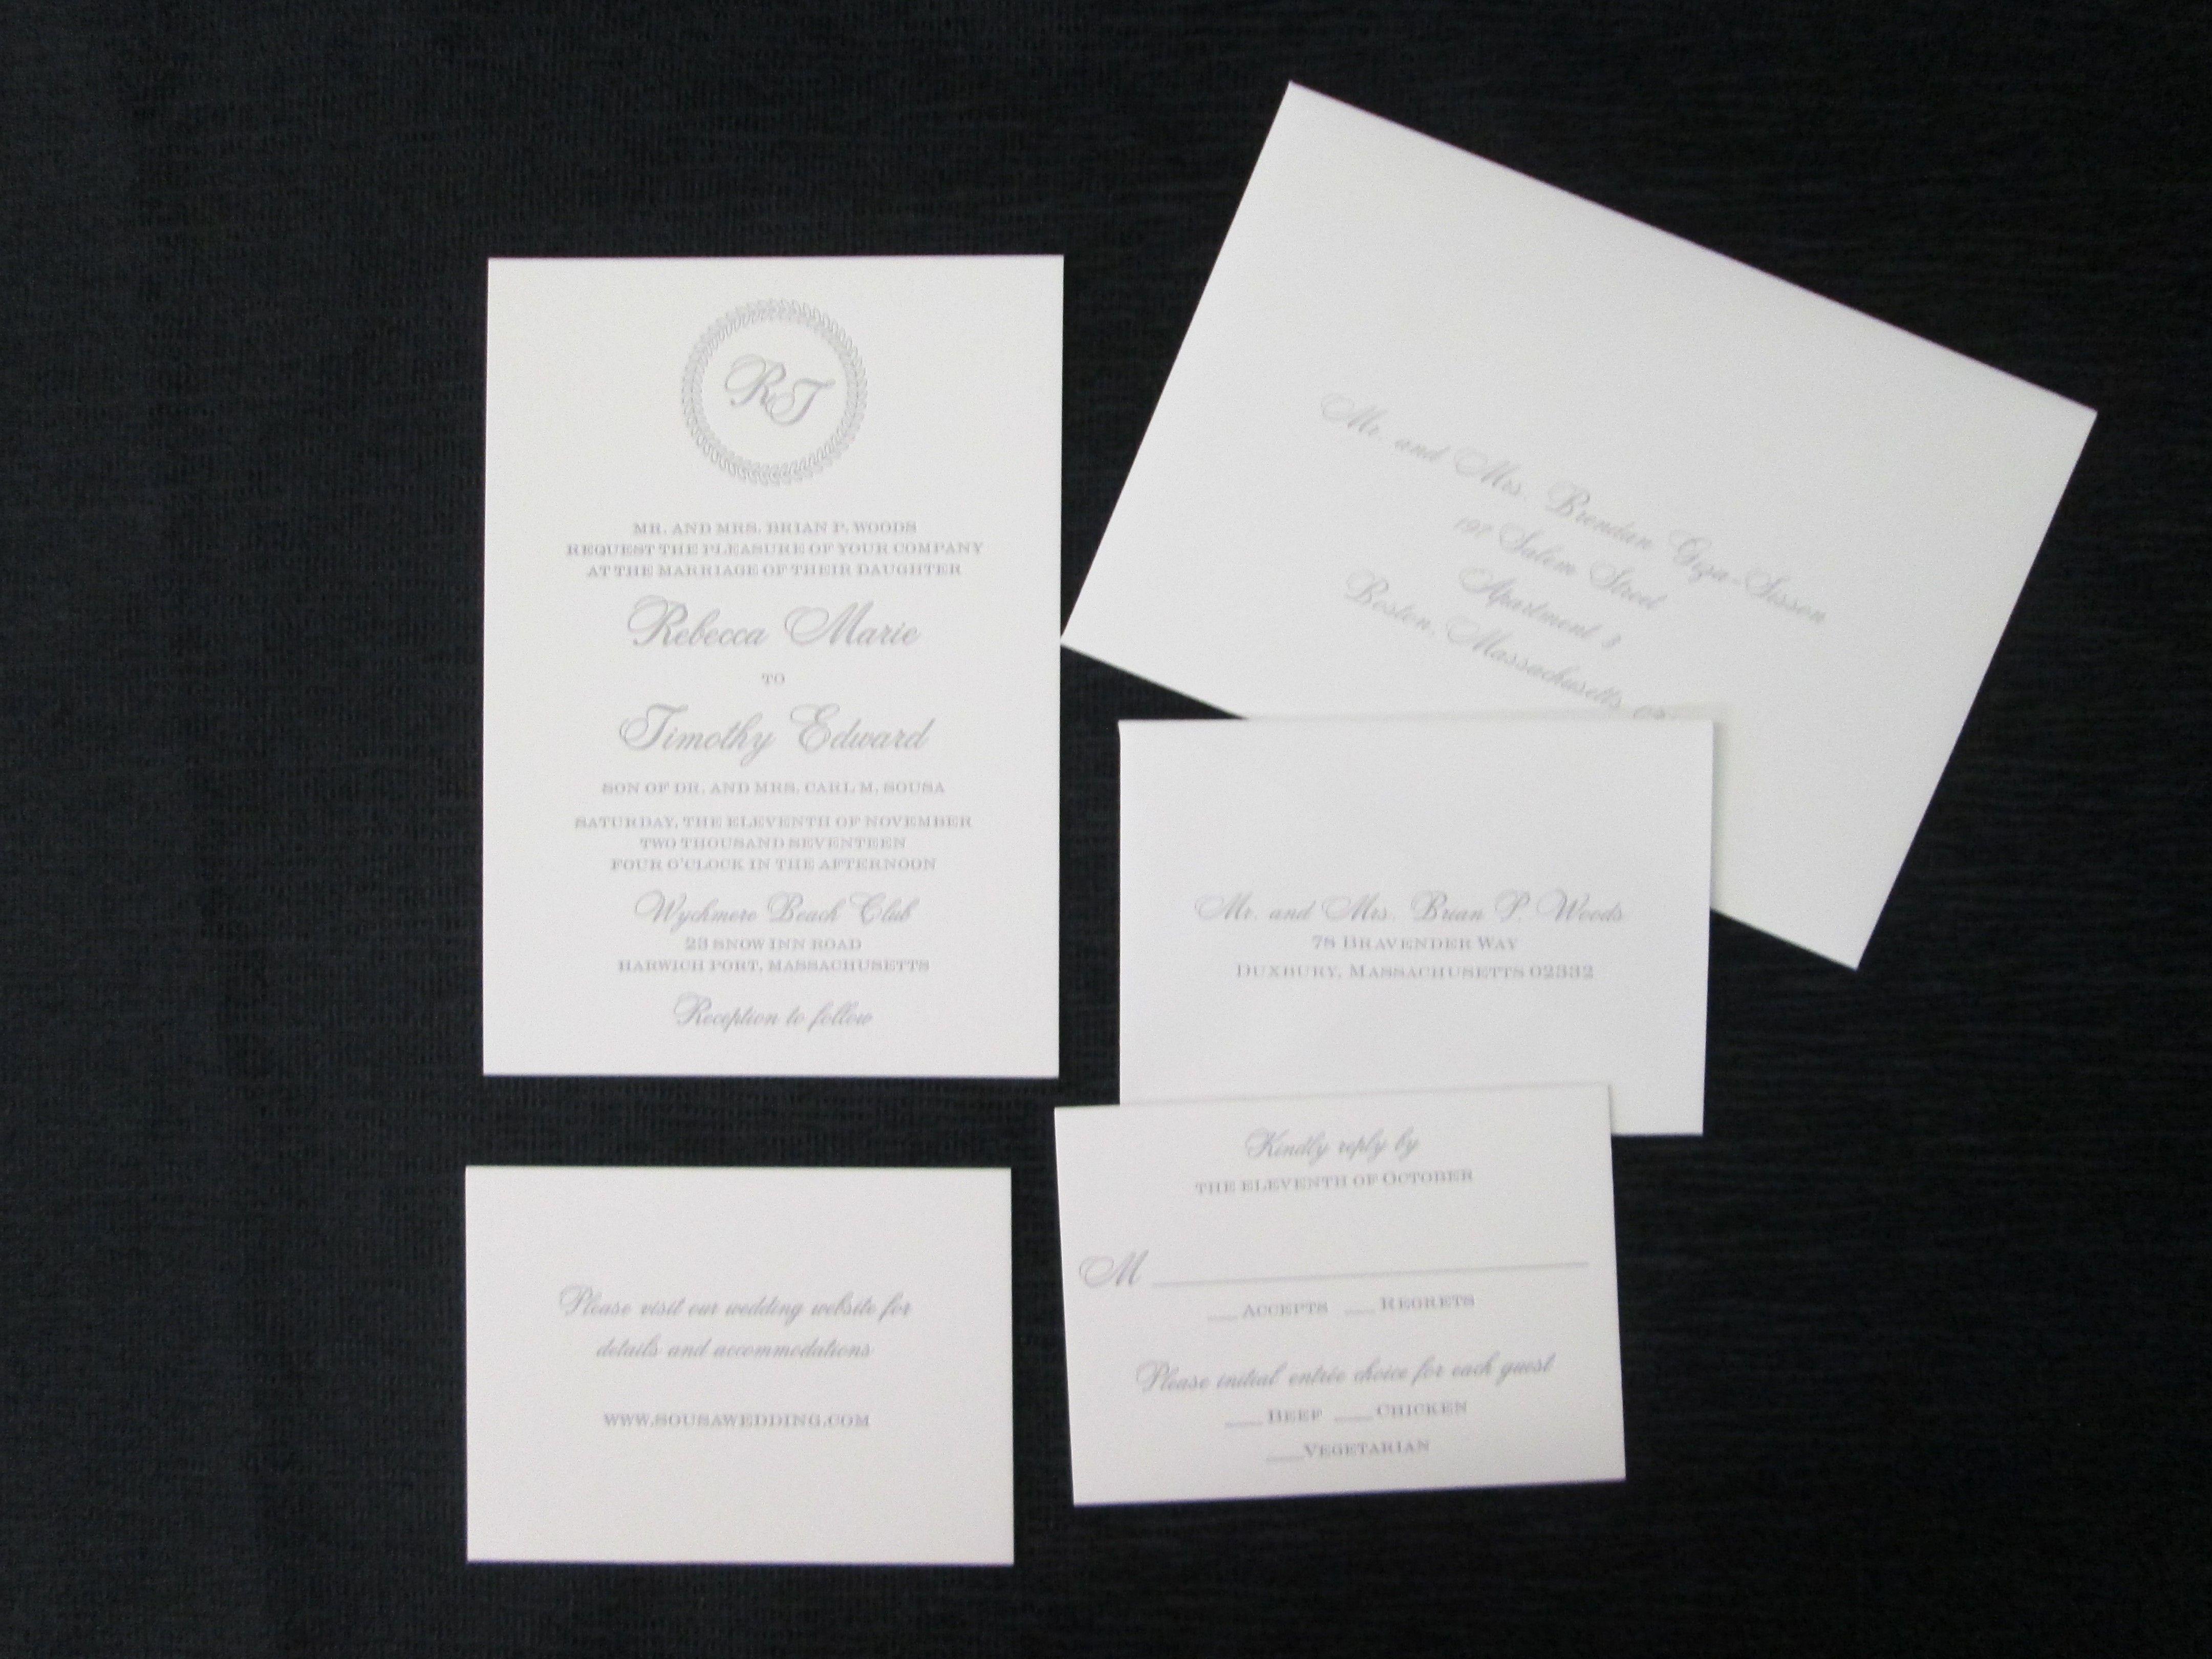 Complete letterpress invitation set with machine envelope addressing ...